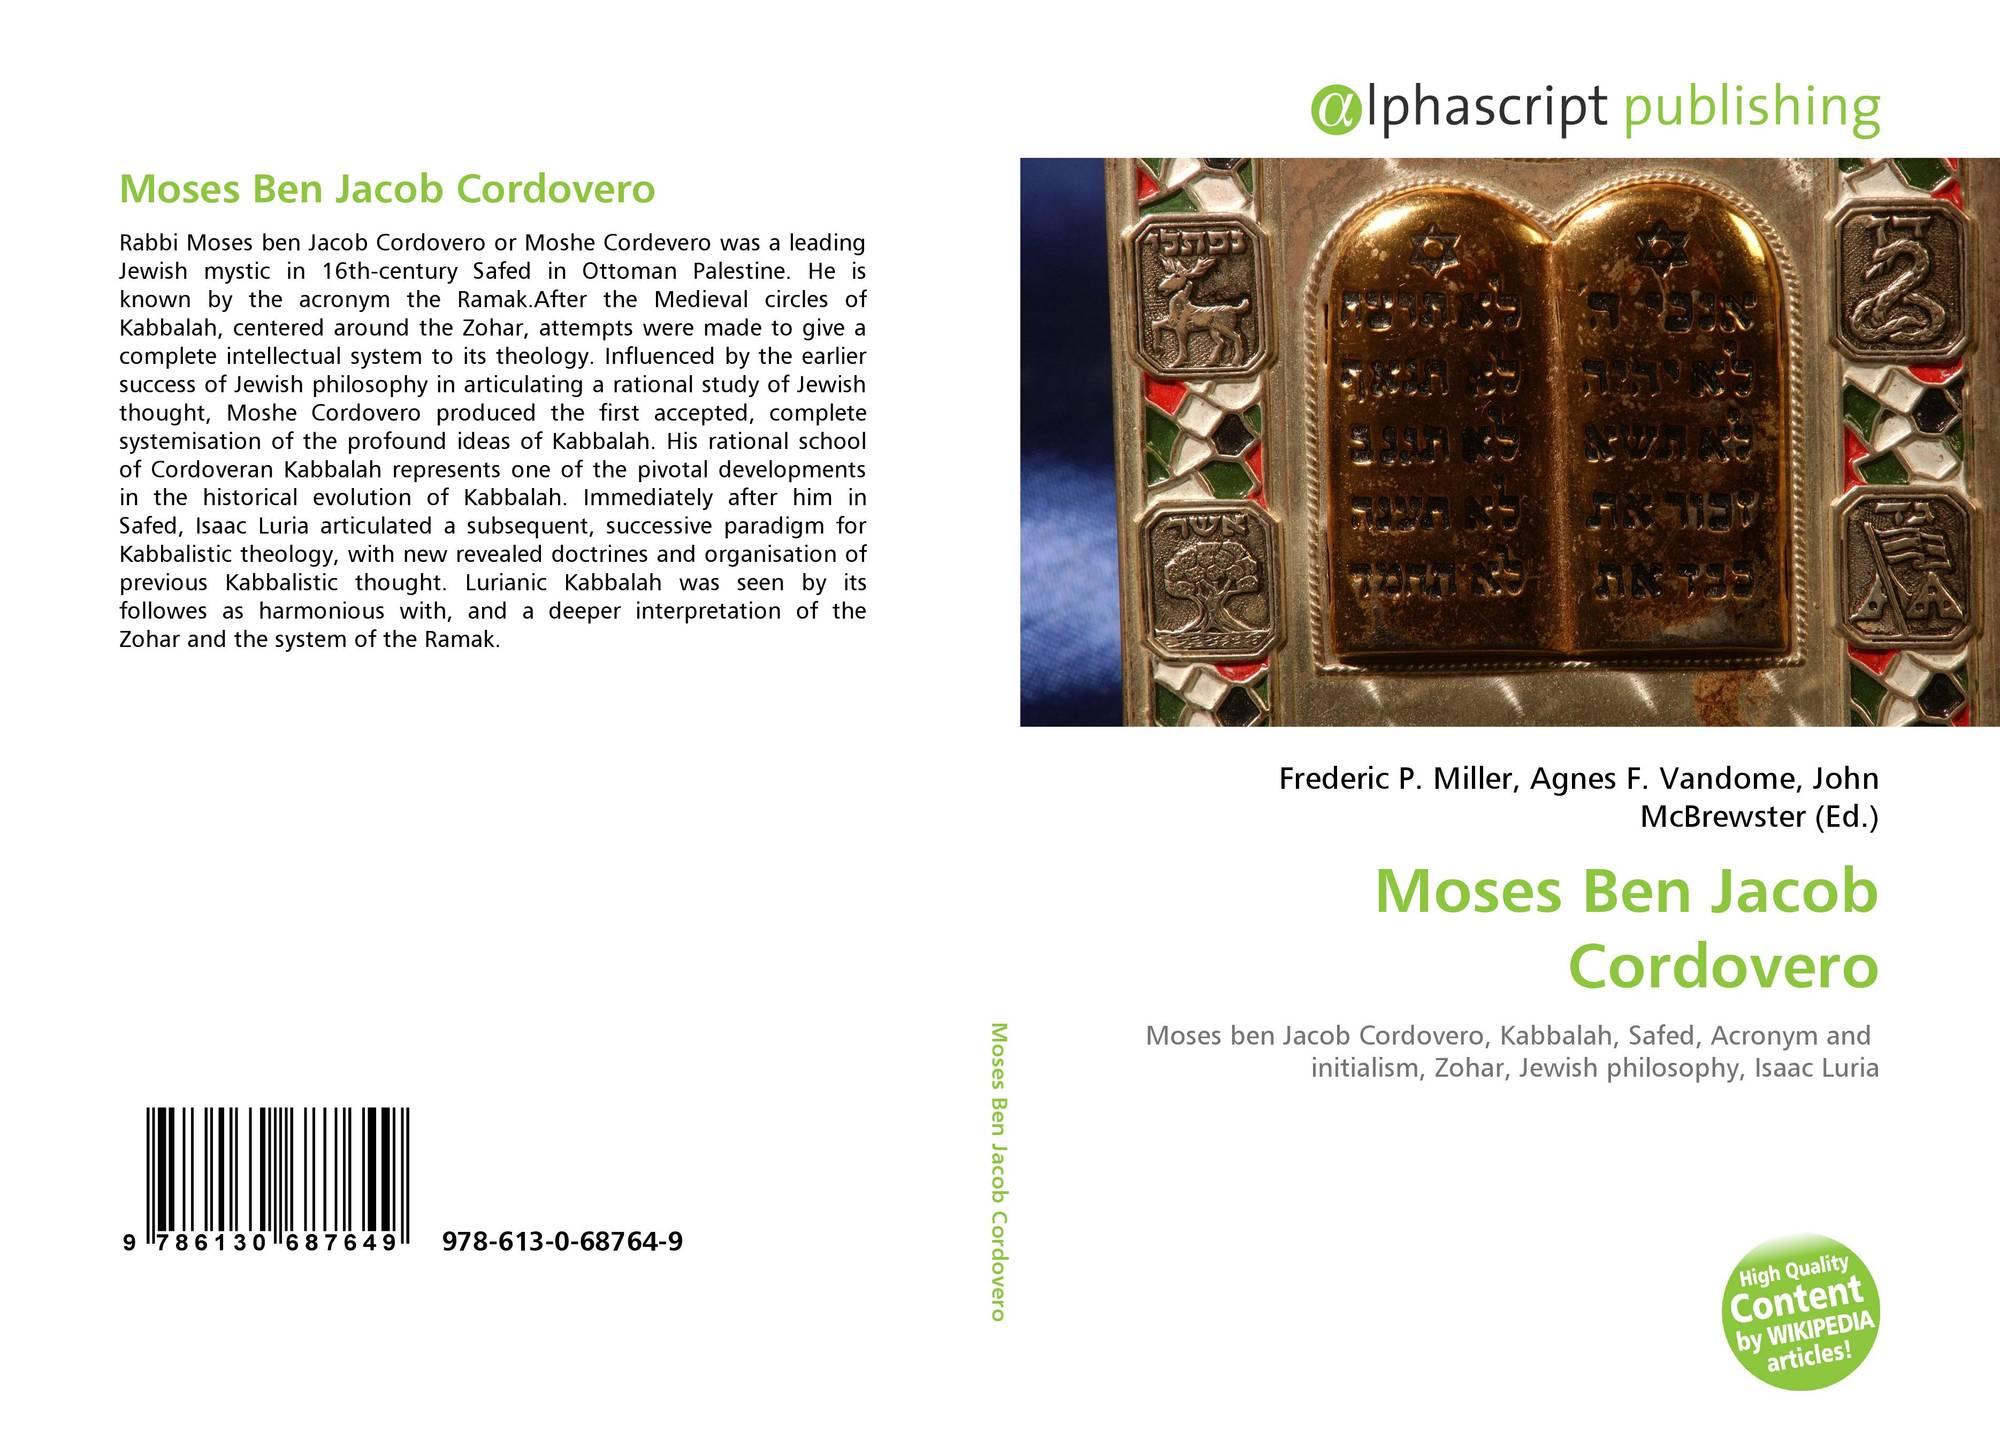 Moses Ben Jacob Cordovero, 978-613-0-68764-9, 6130687648